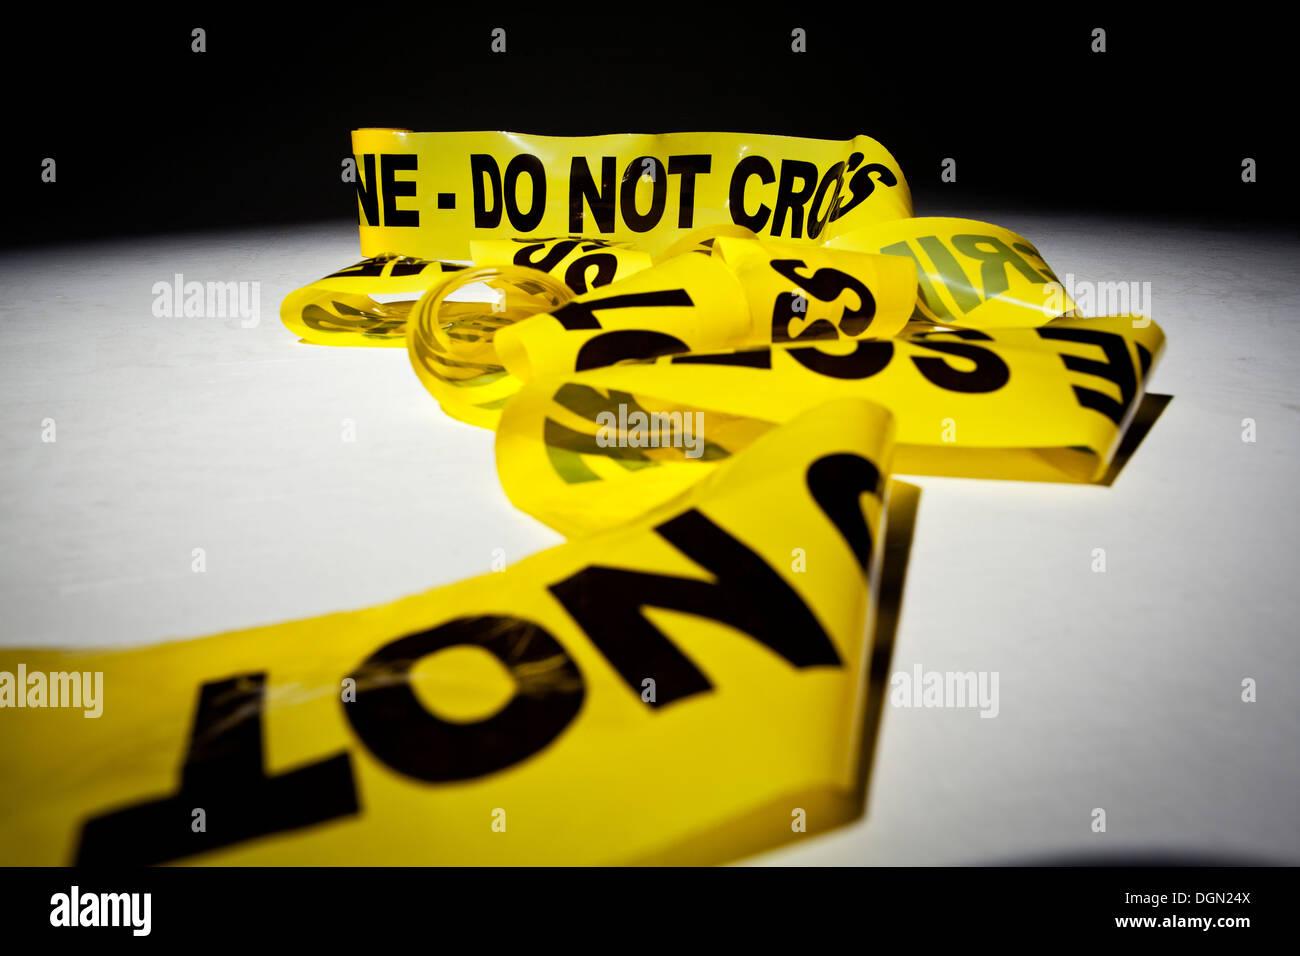 crime scene do not cross yellow tape stock photo 61928298 alamy